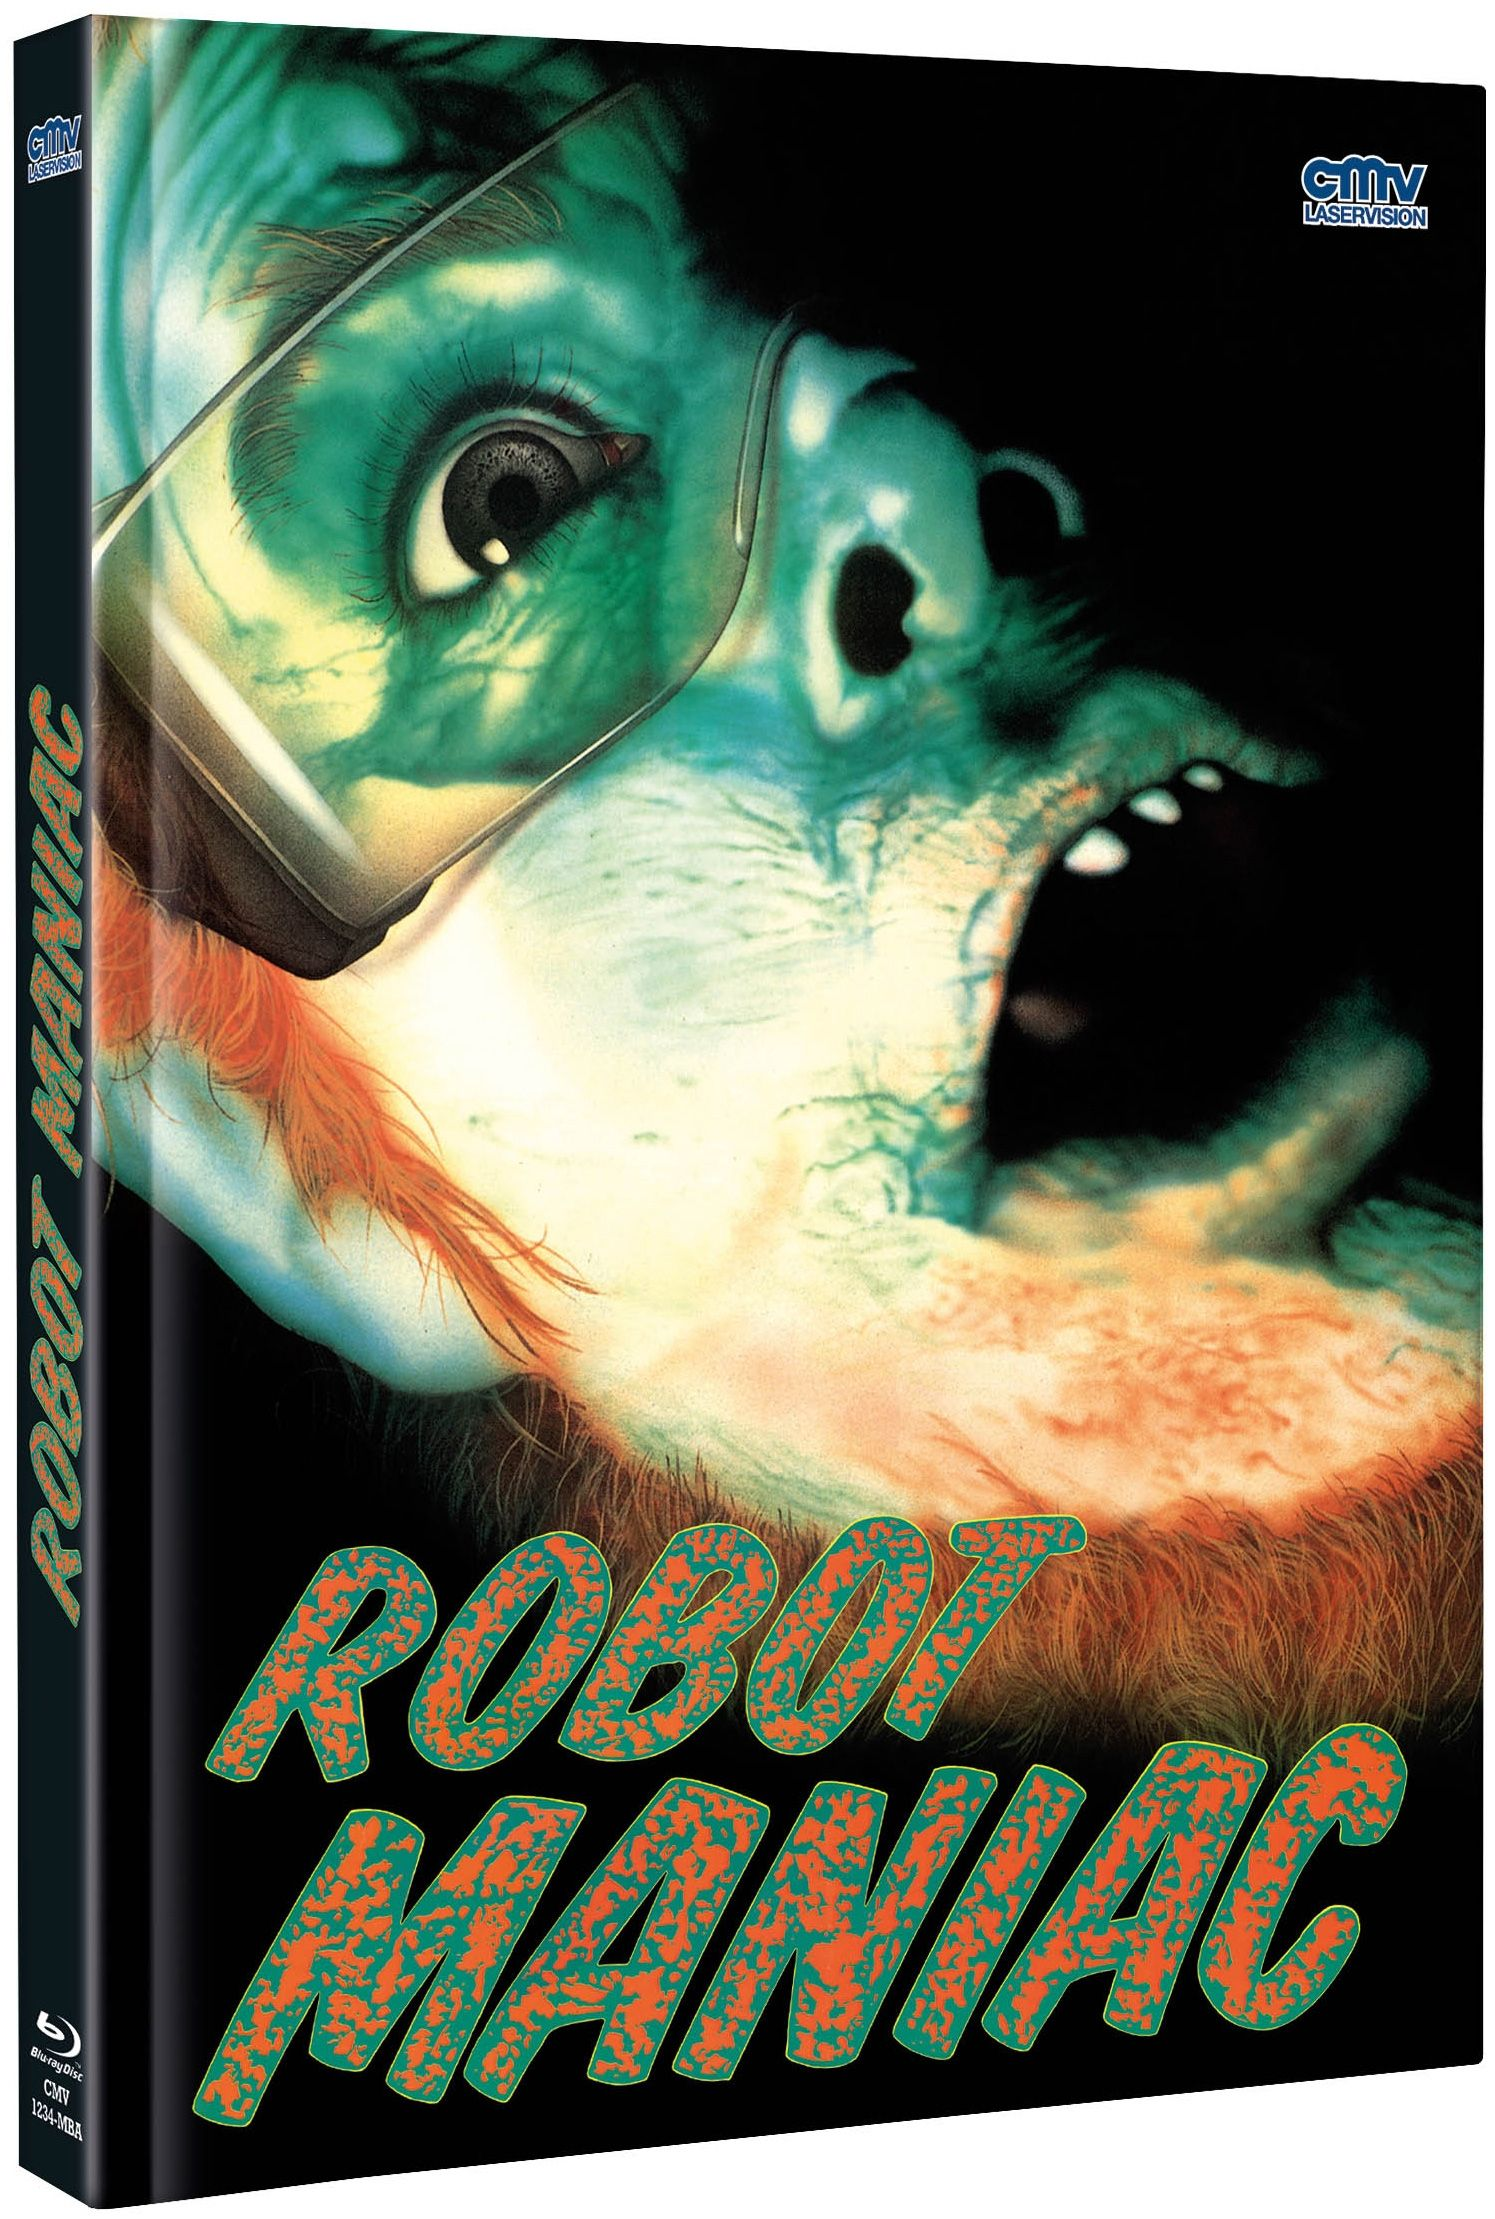 Robot Maniac (Lim. Uncut Mediabook - Cover A) (DVD + BLURAY)